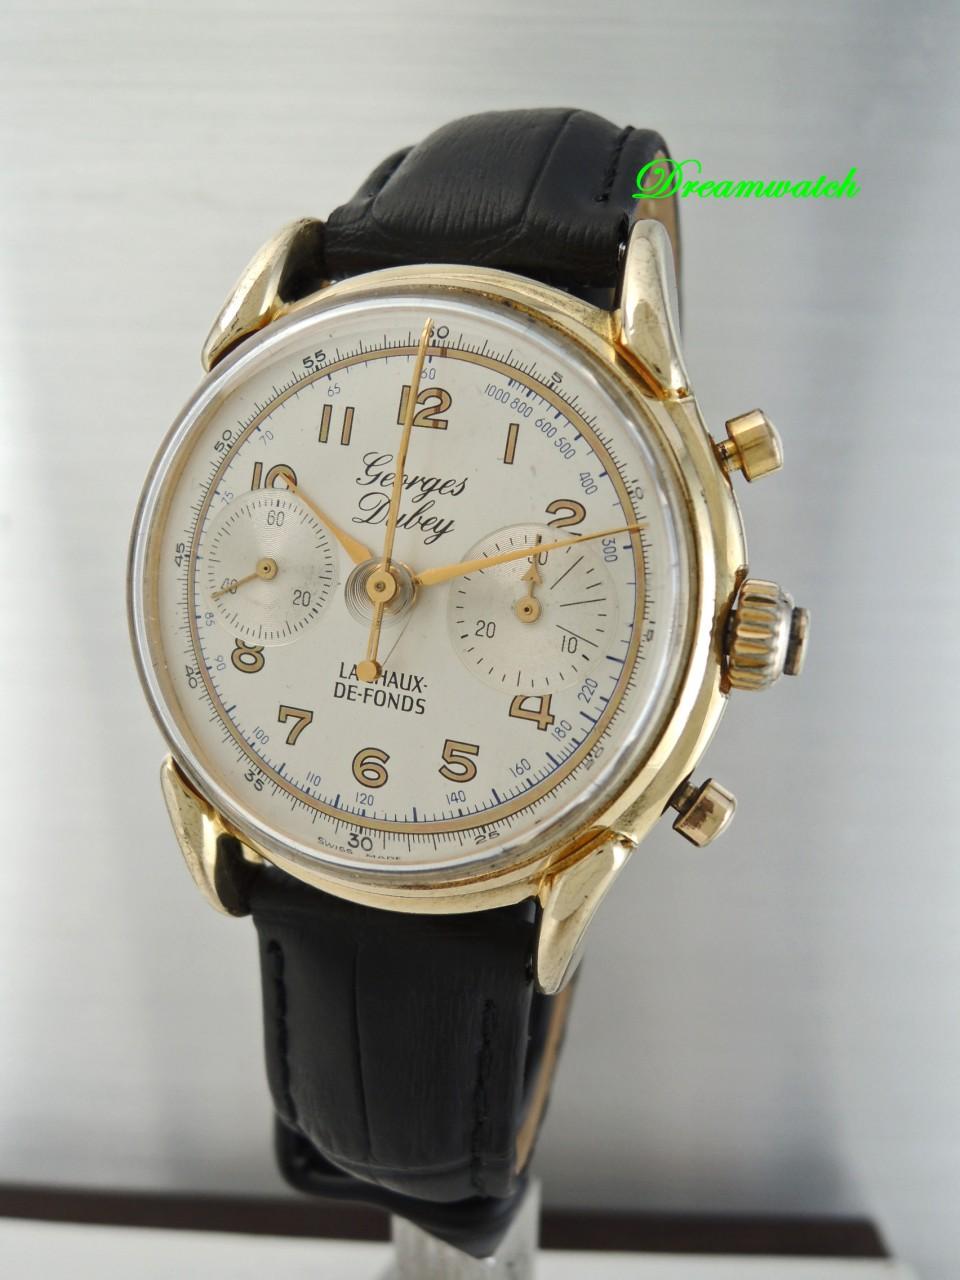 Vintage Georges Dubey Rattrapante Chronograph